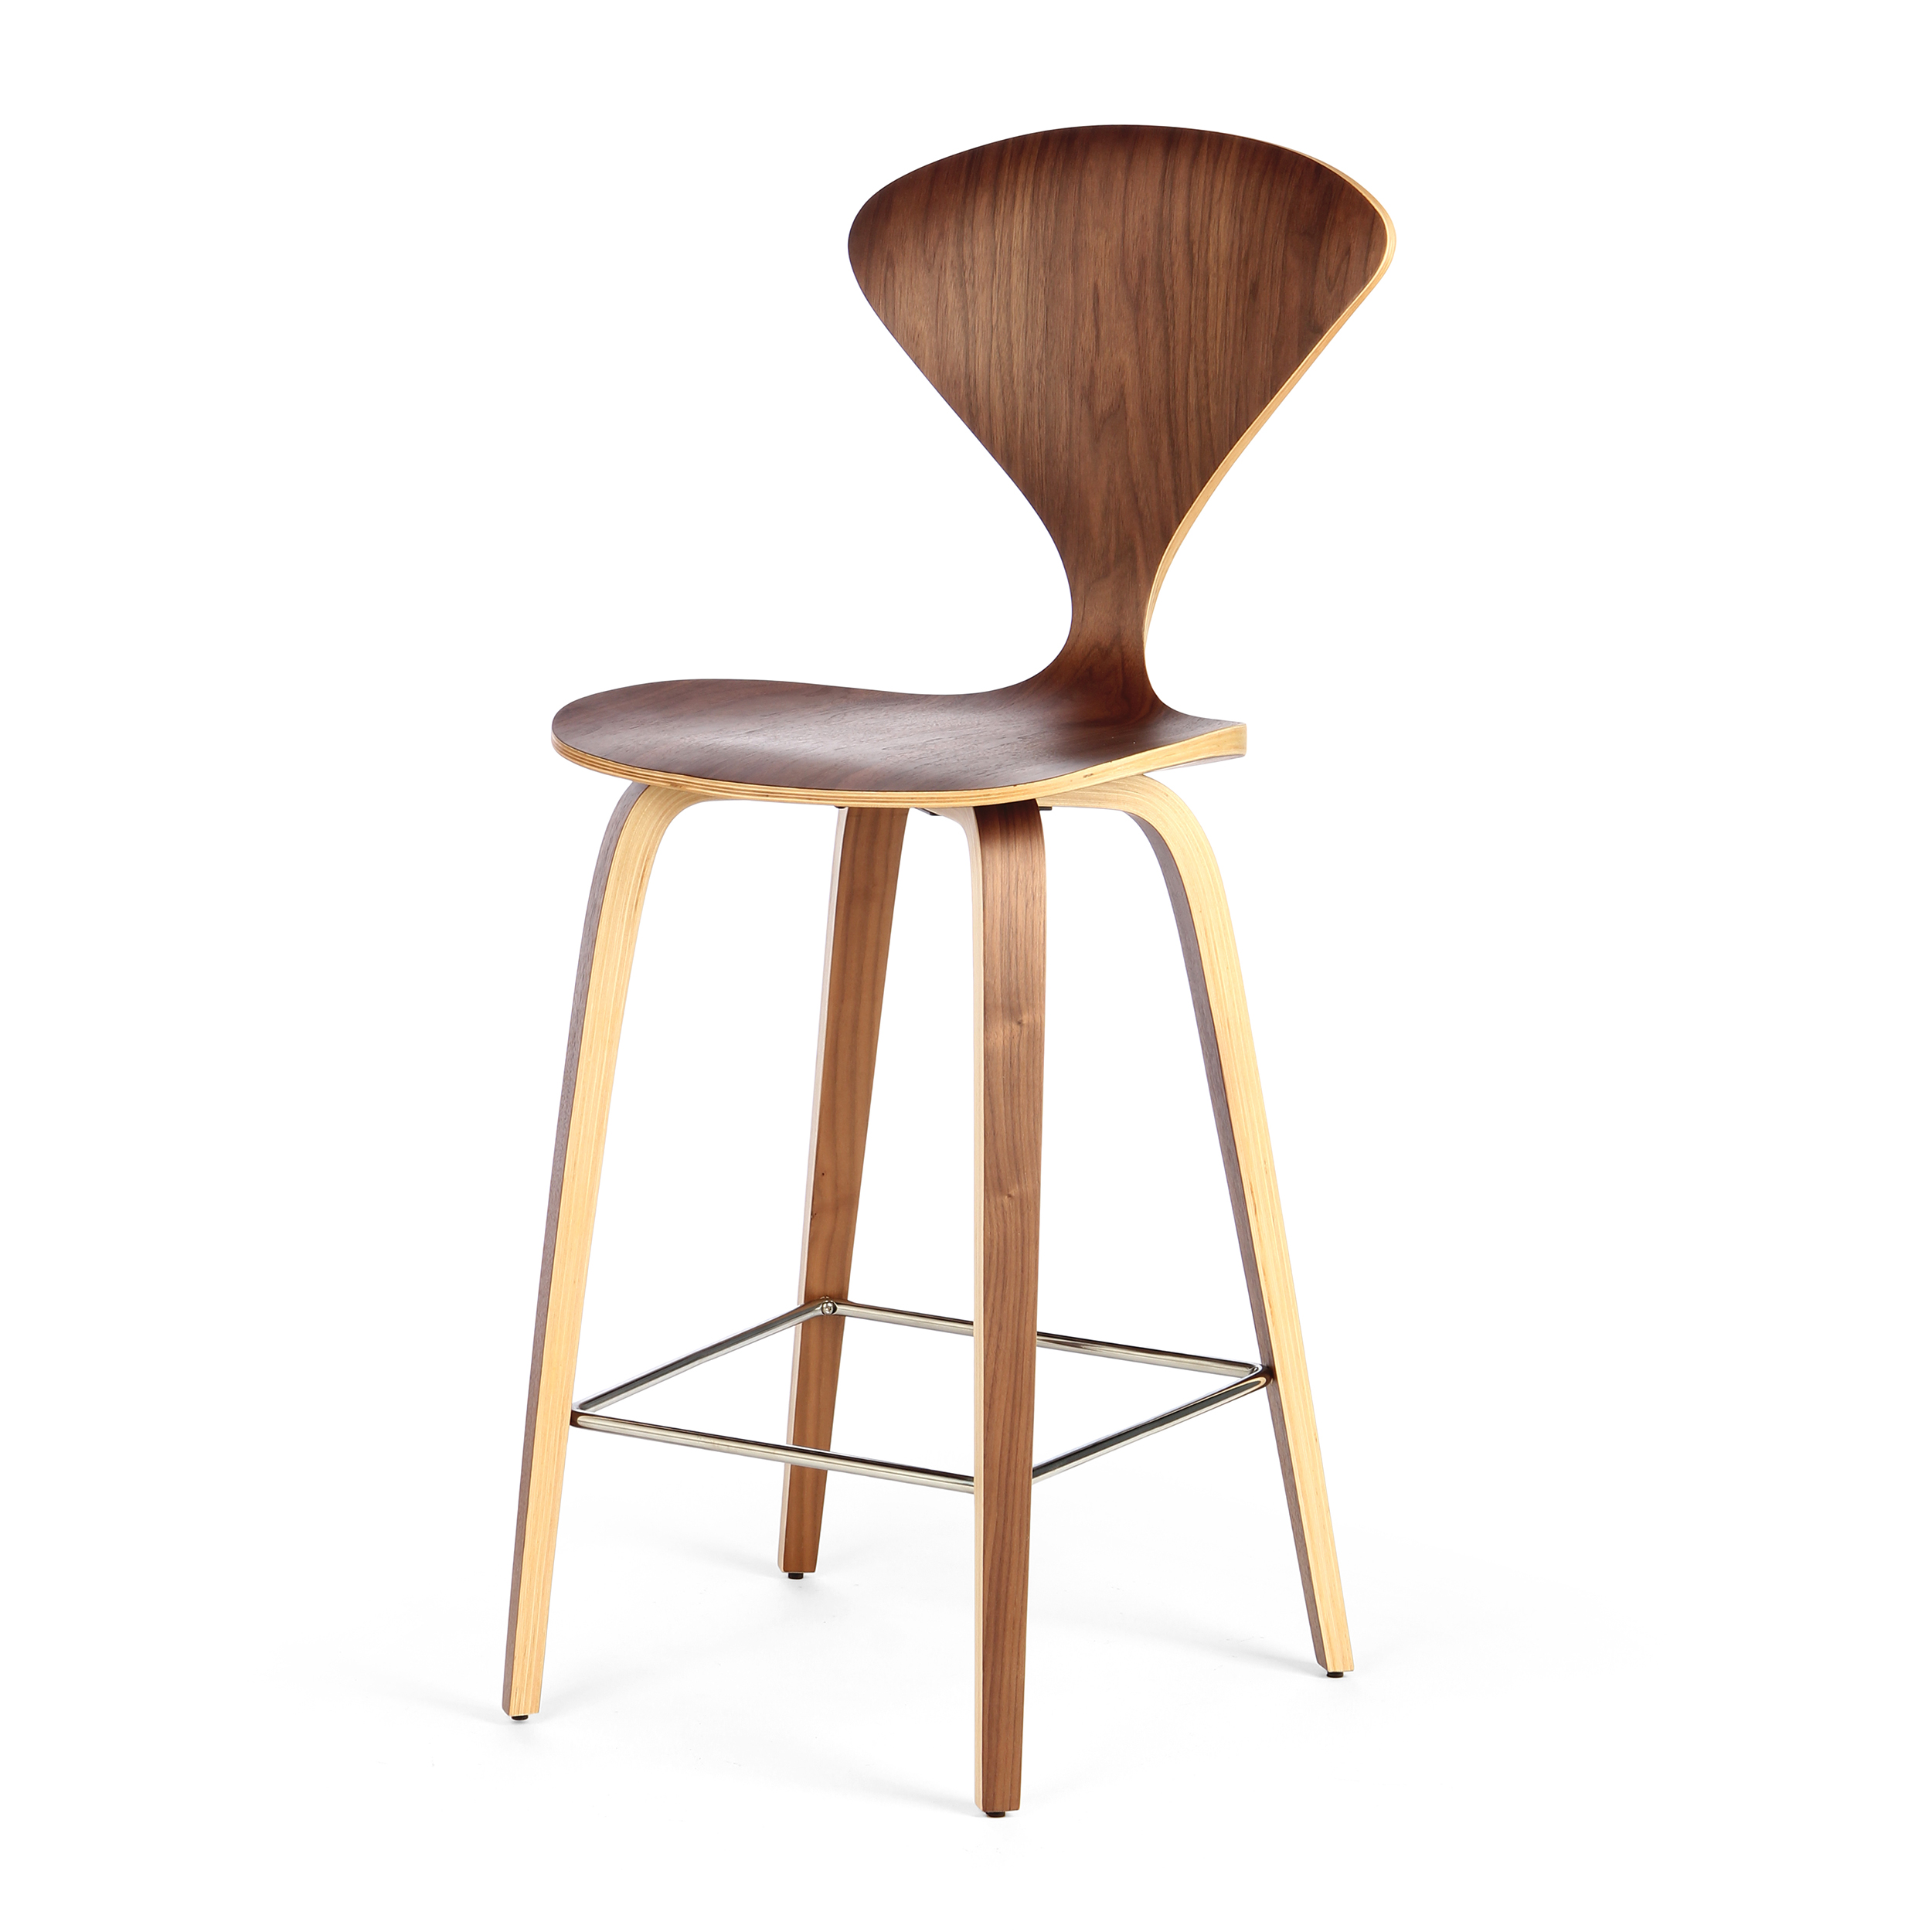 Барный стул Cherner высота 102 стул барный cosmo cherner